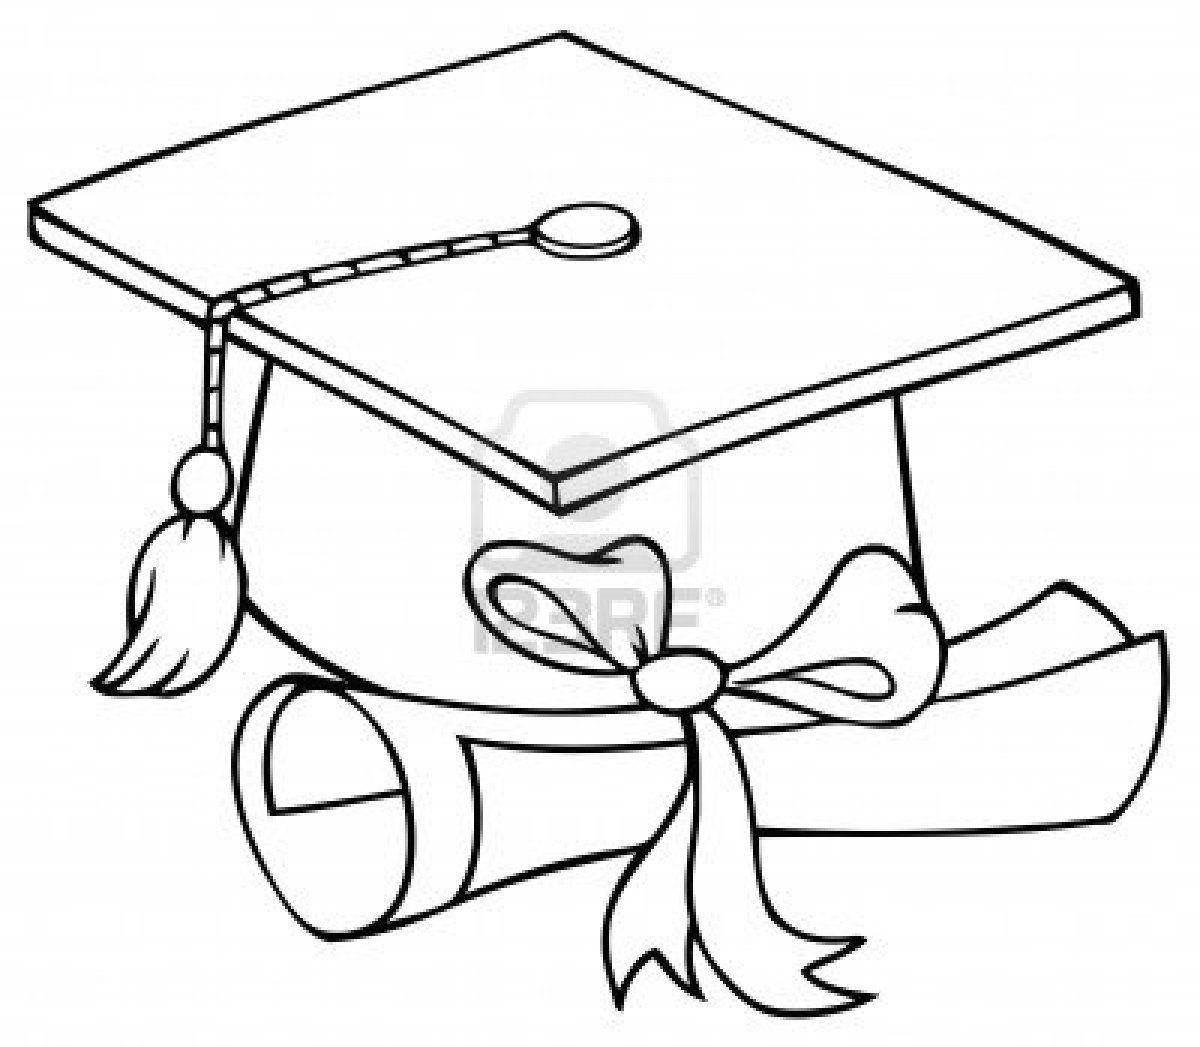 Graduation Cap Coloring Page | Graduation Cap Coloring Page